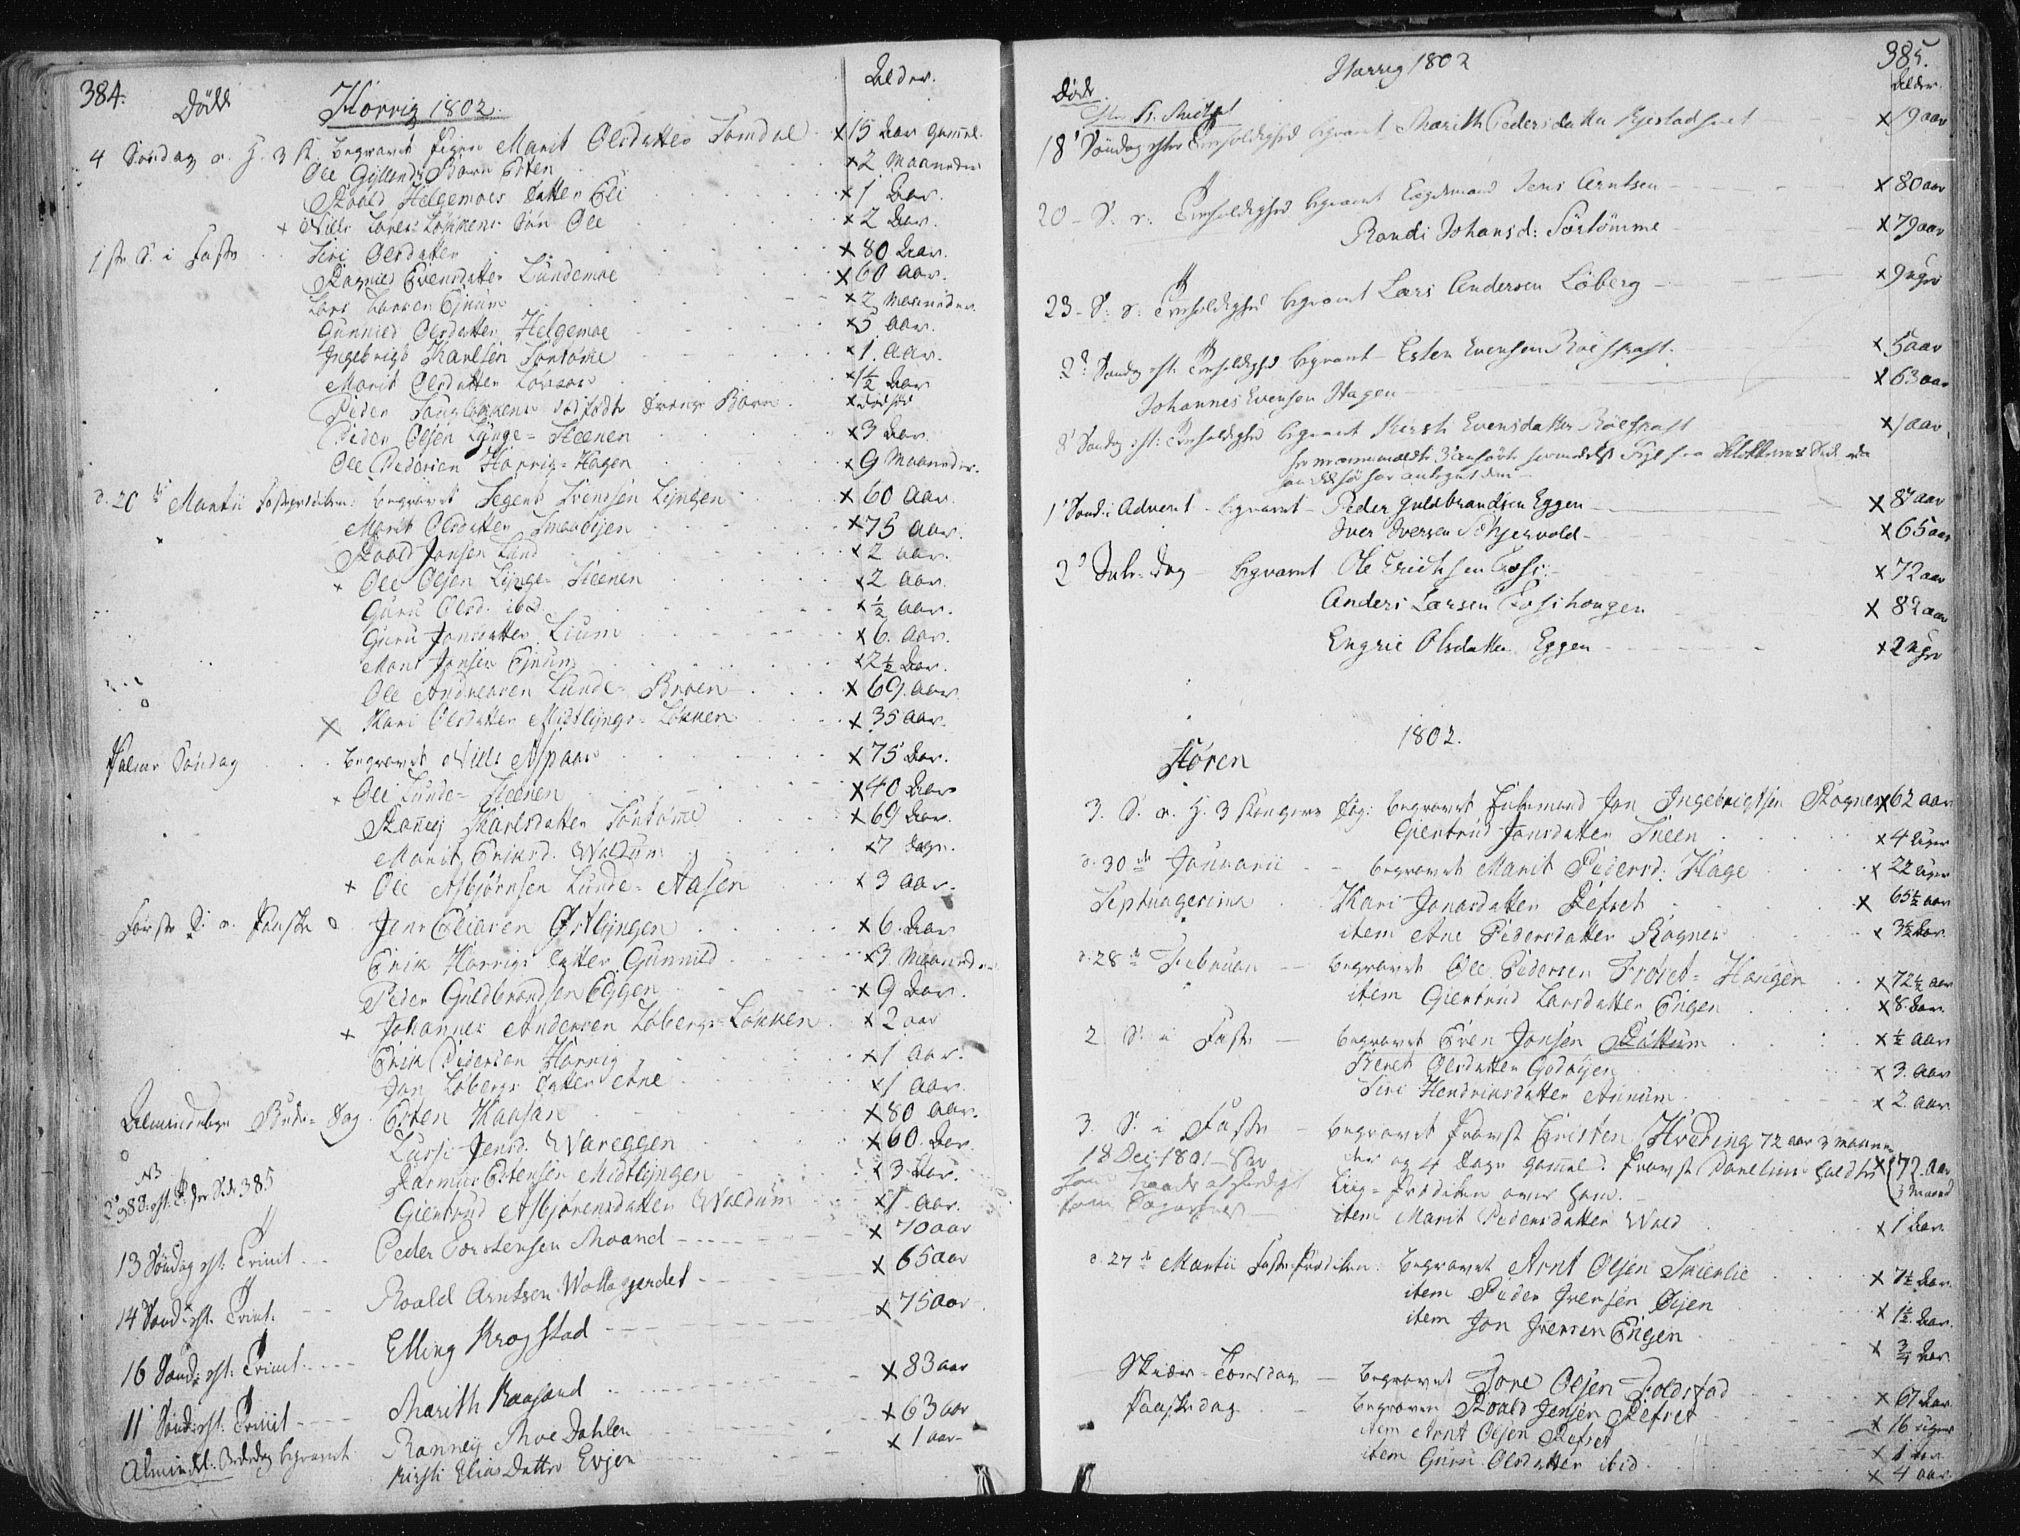 SAT, Ministerialprotokoller, klokkerbøker og fødselsregistre - Sør-Trøndelag, 687/L0992: Parish register (official) no. 687A03 /1, 1788-1815, p. 384-385